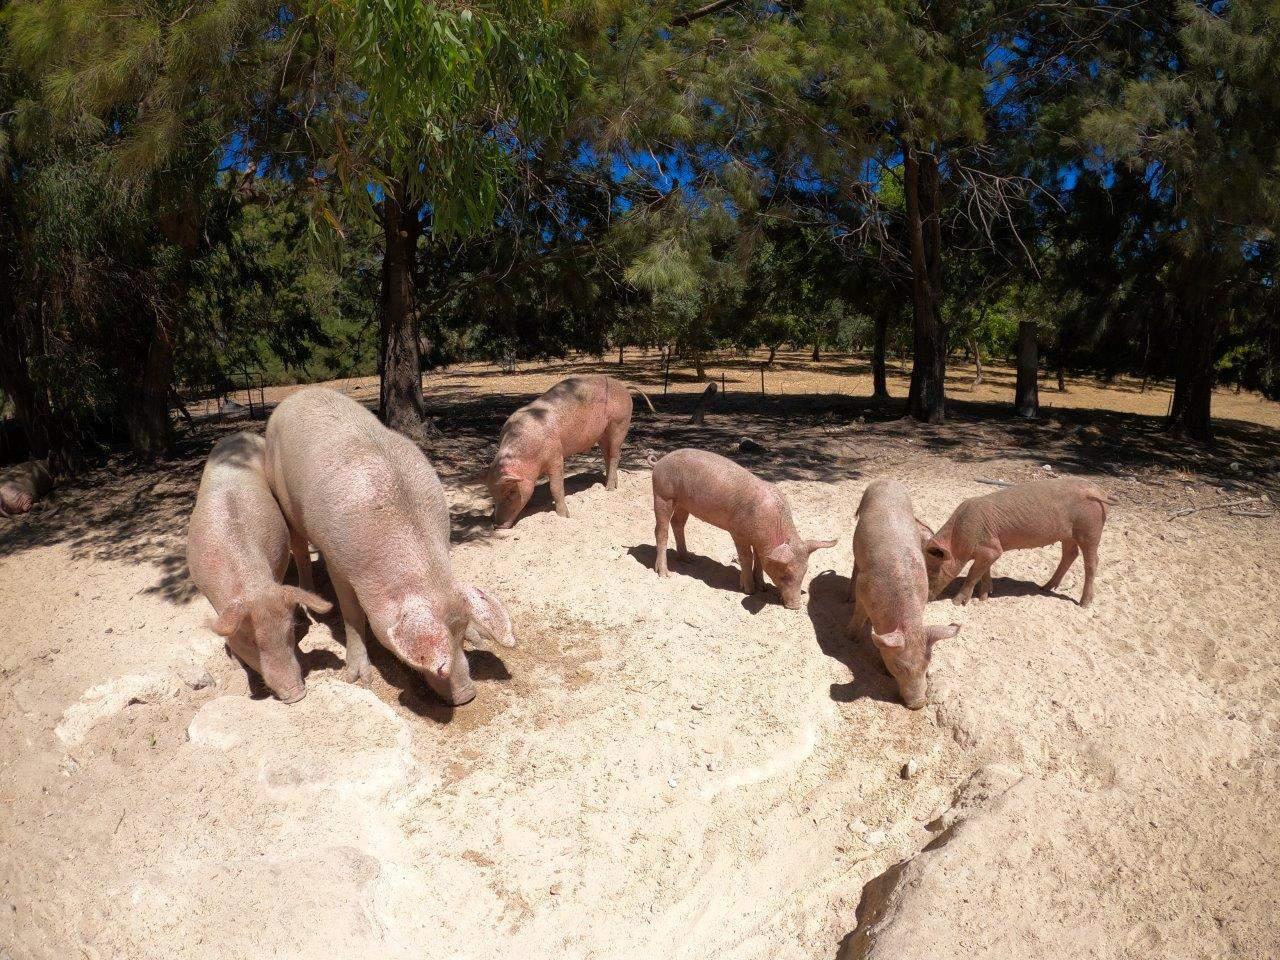 Enjoying the pigs